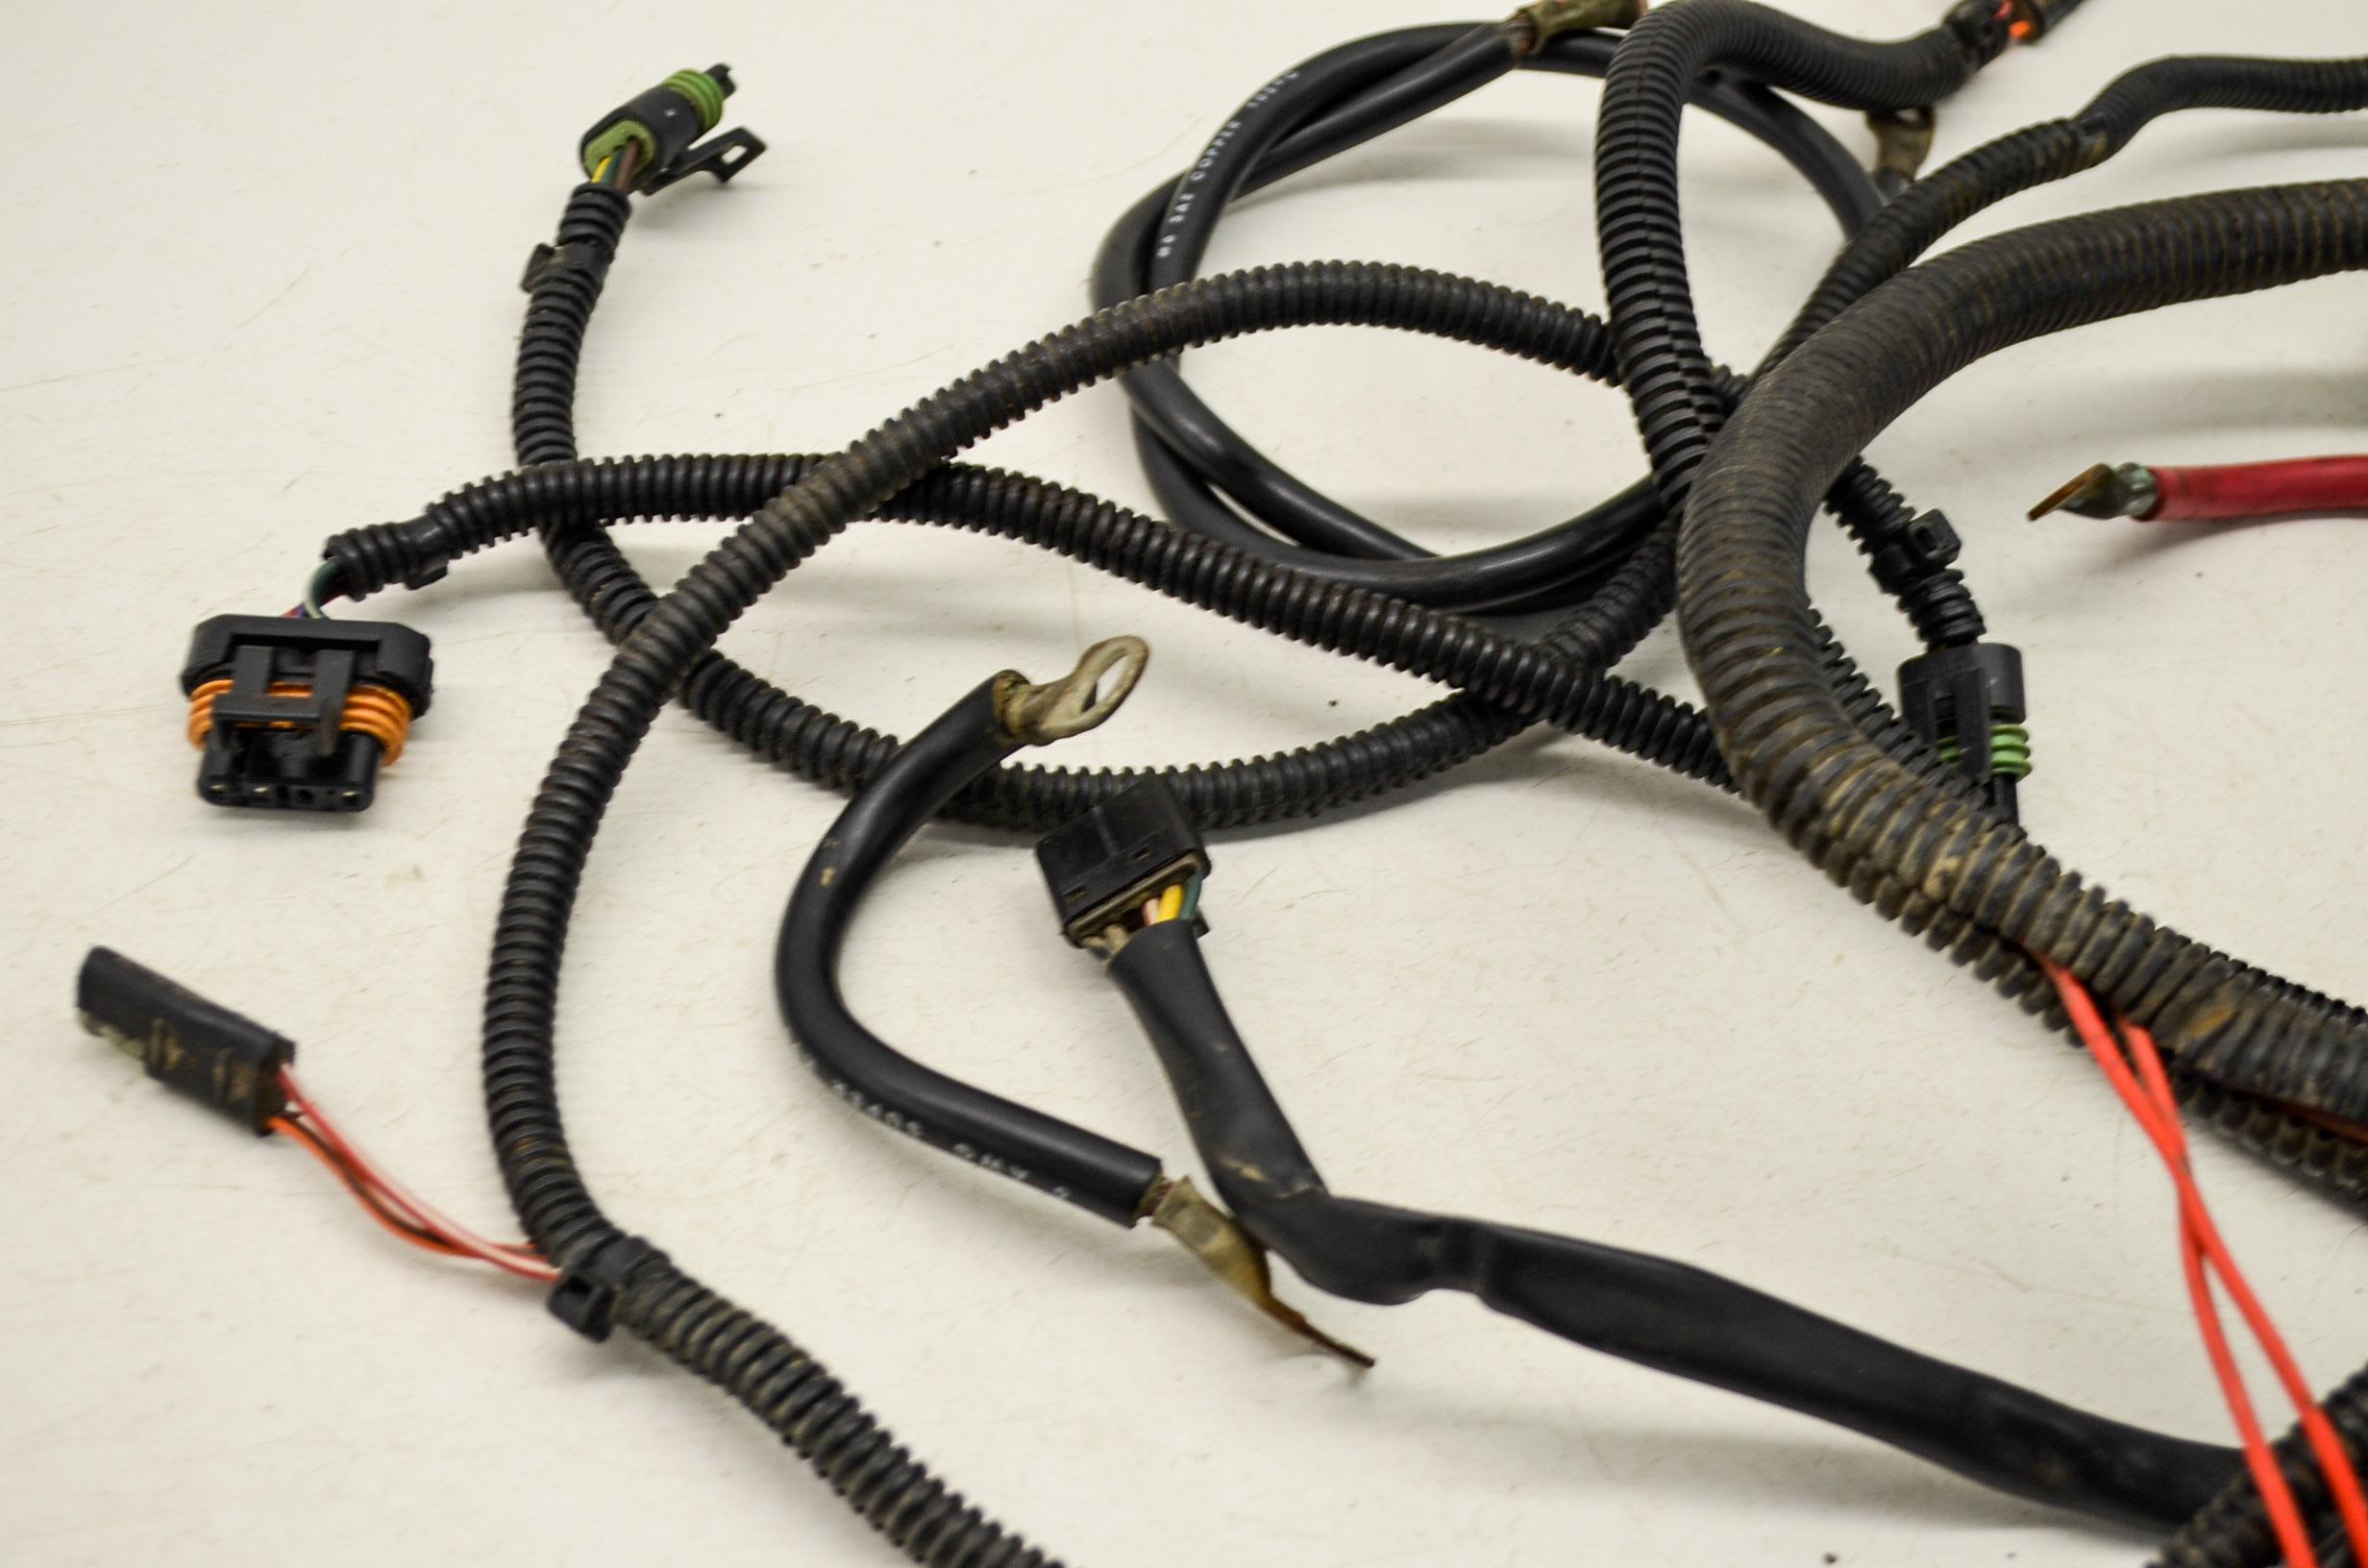 03 polaris trailboss 330 2x4 wire harness electrical wiring ebay rh ebay com 2003 Polaris Magnum 330 2X4 2001 Polaris Trail Boss 325